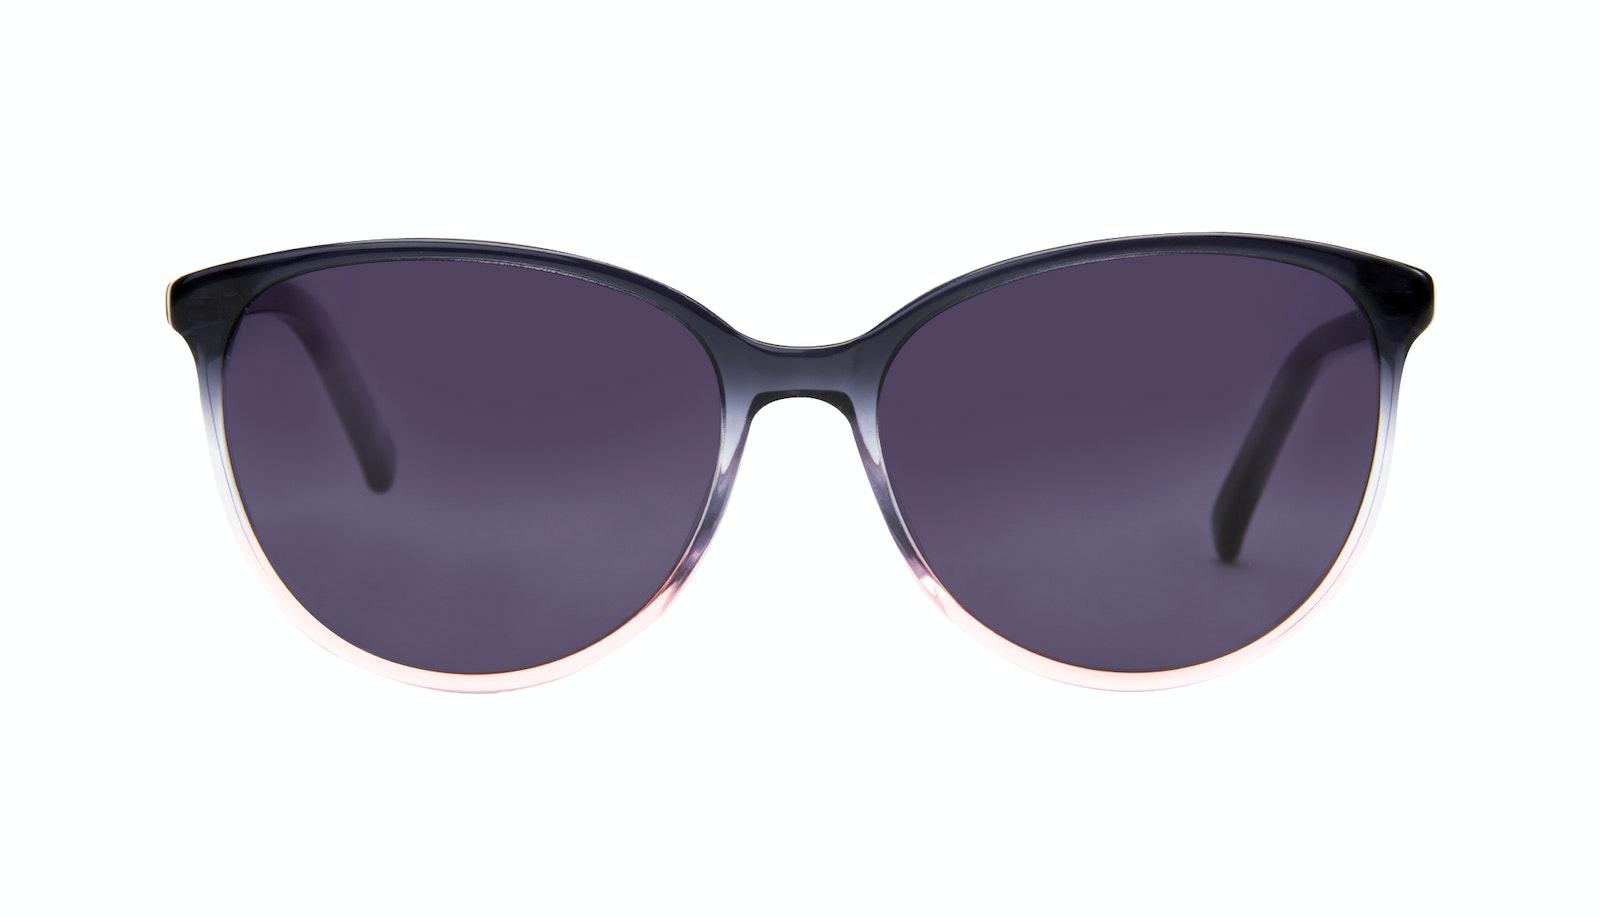 Affordable Fashion Glasses Cat Eye Sunglasses Women Imagine Pink Dust